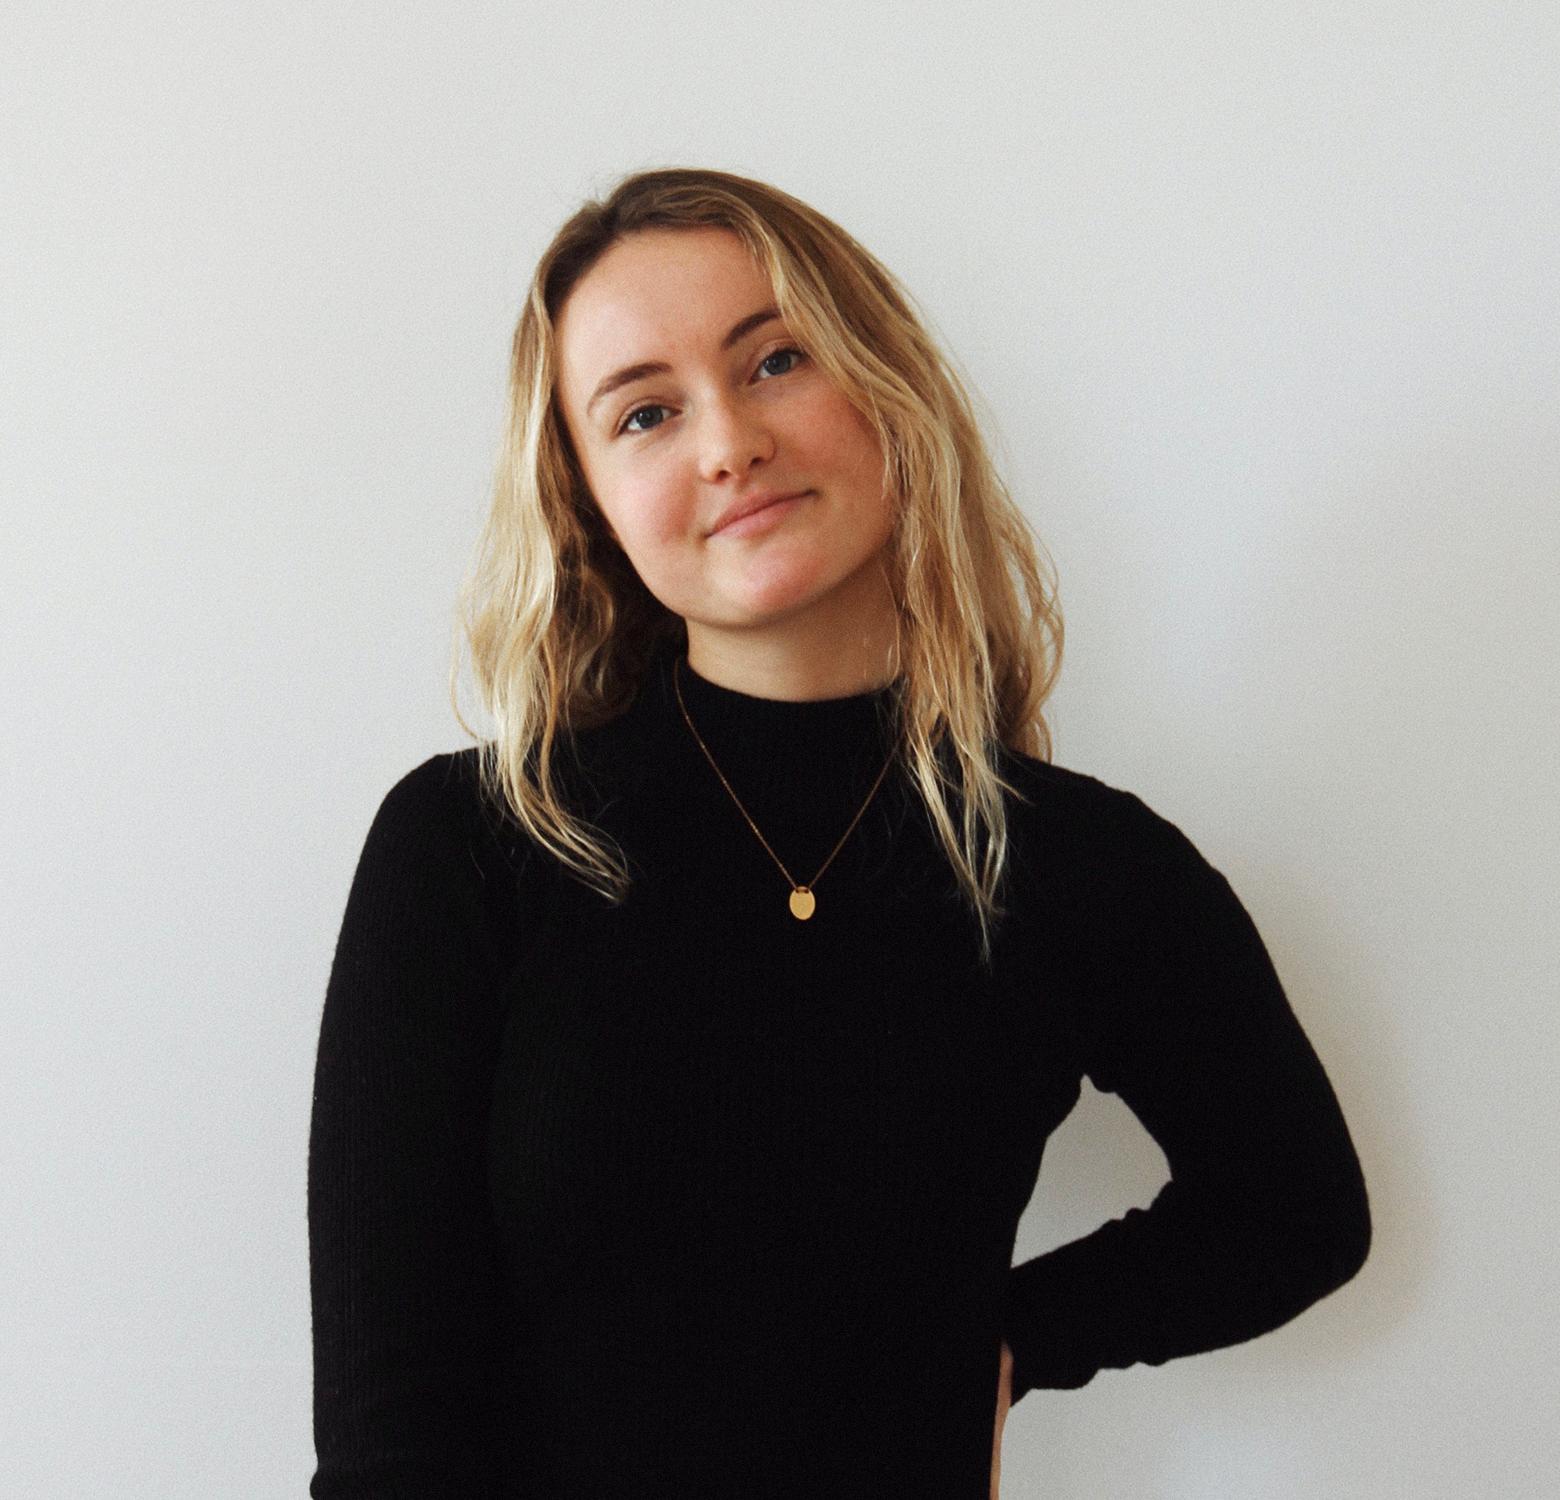 Anastasia Collet, winner of our 2021 internship contest